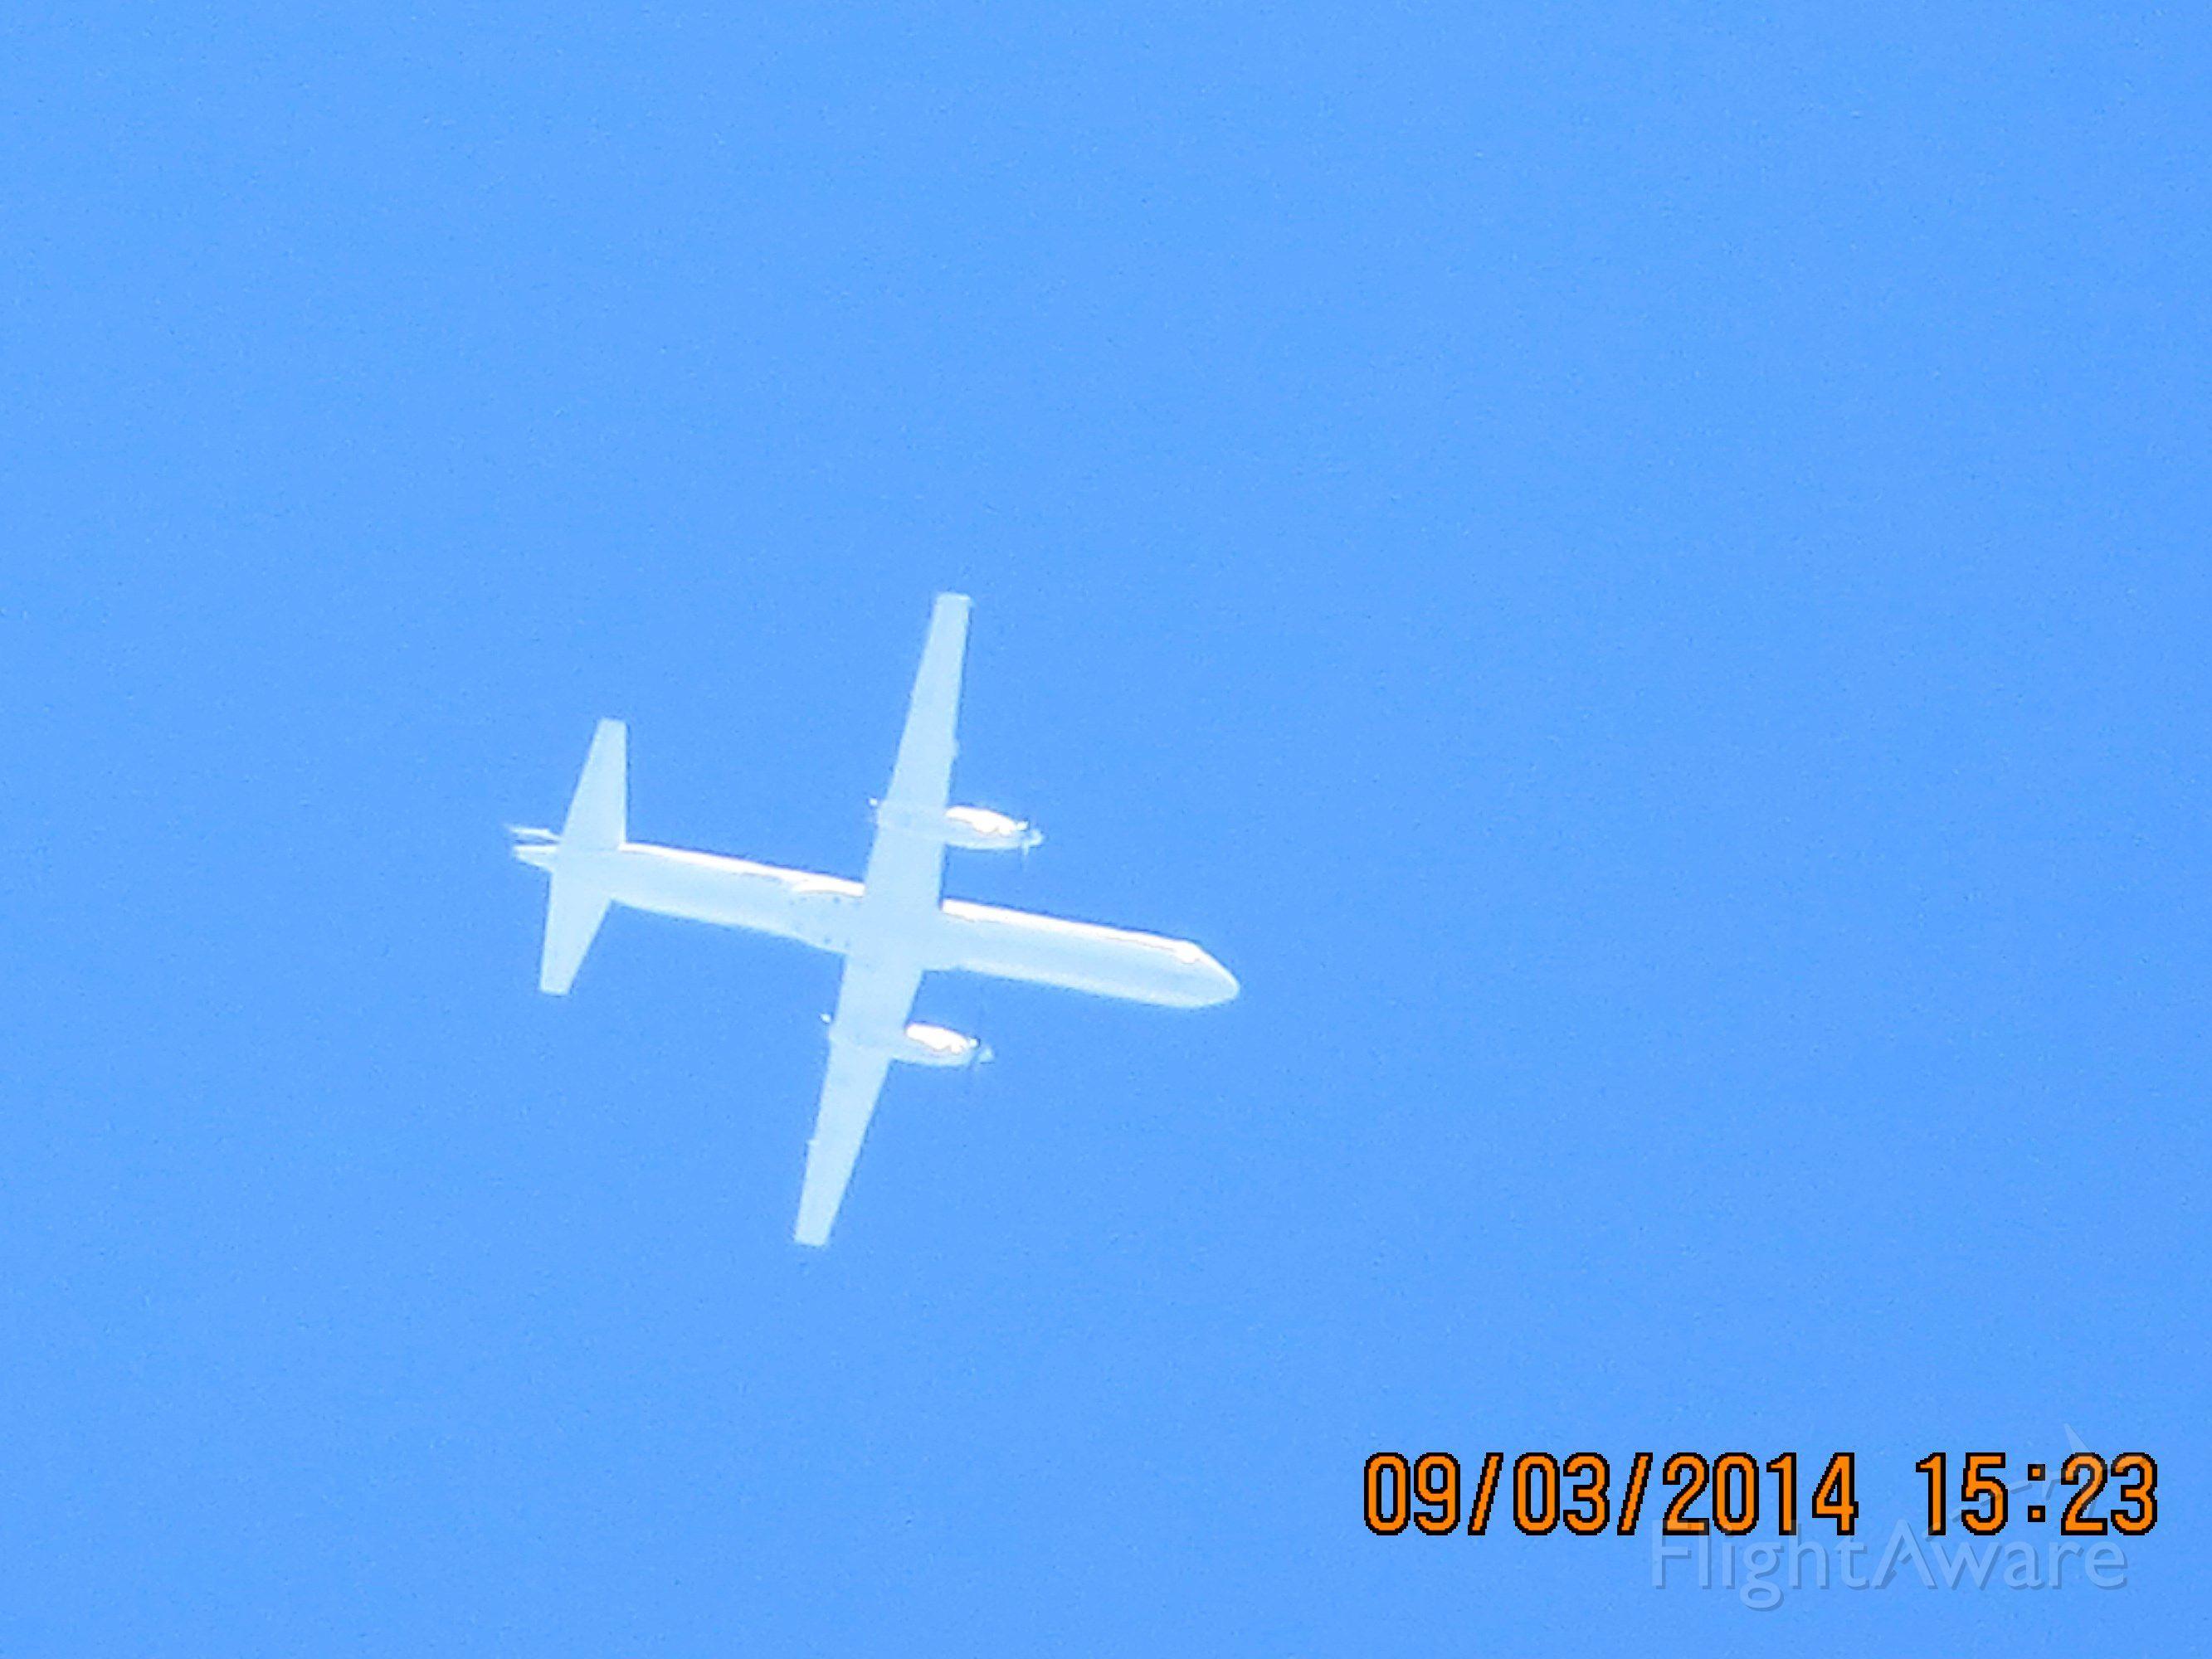 Saab 2000 (N814BB) - Saab 2000 from MOT to LFT over Baxter Springs KS (78KS) at 31k feet.